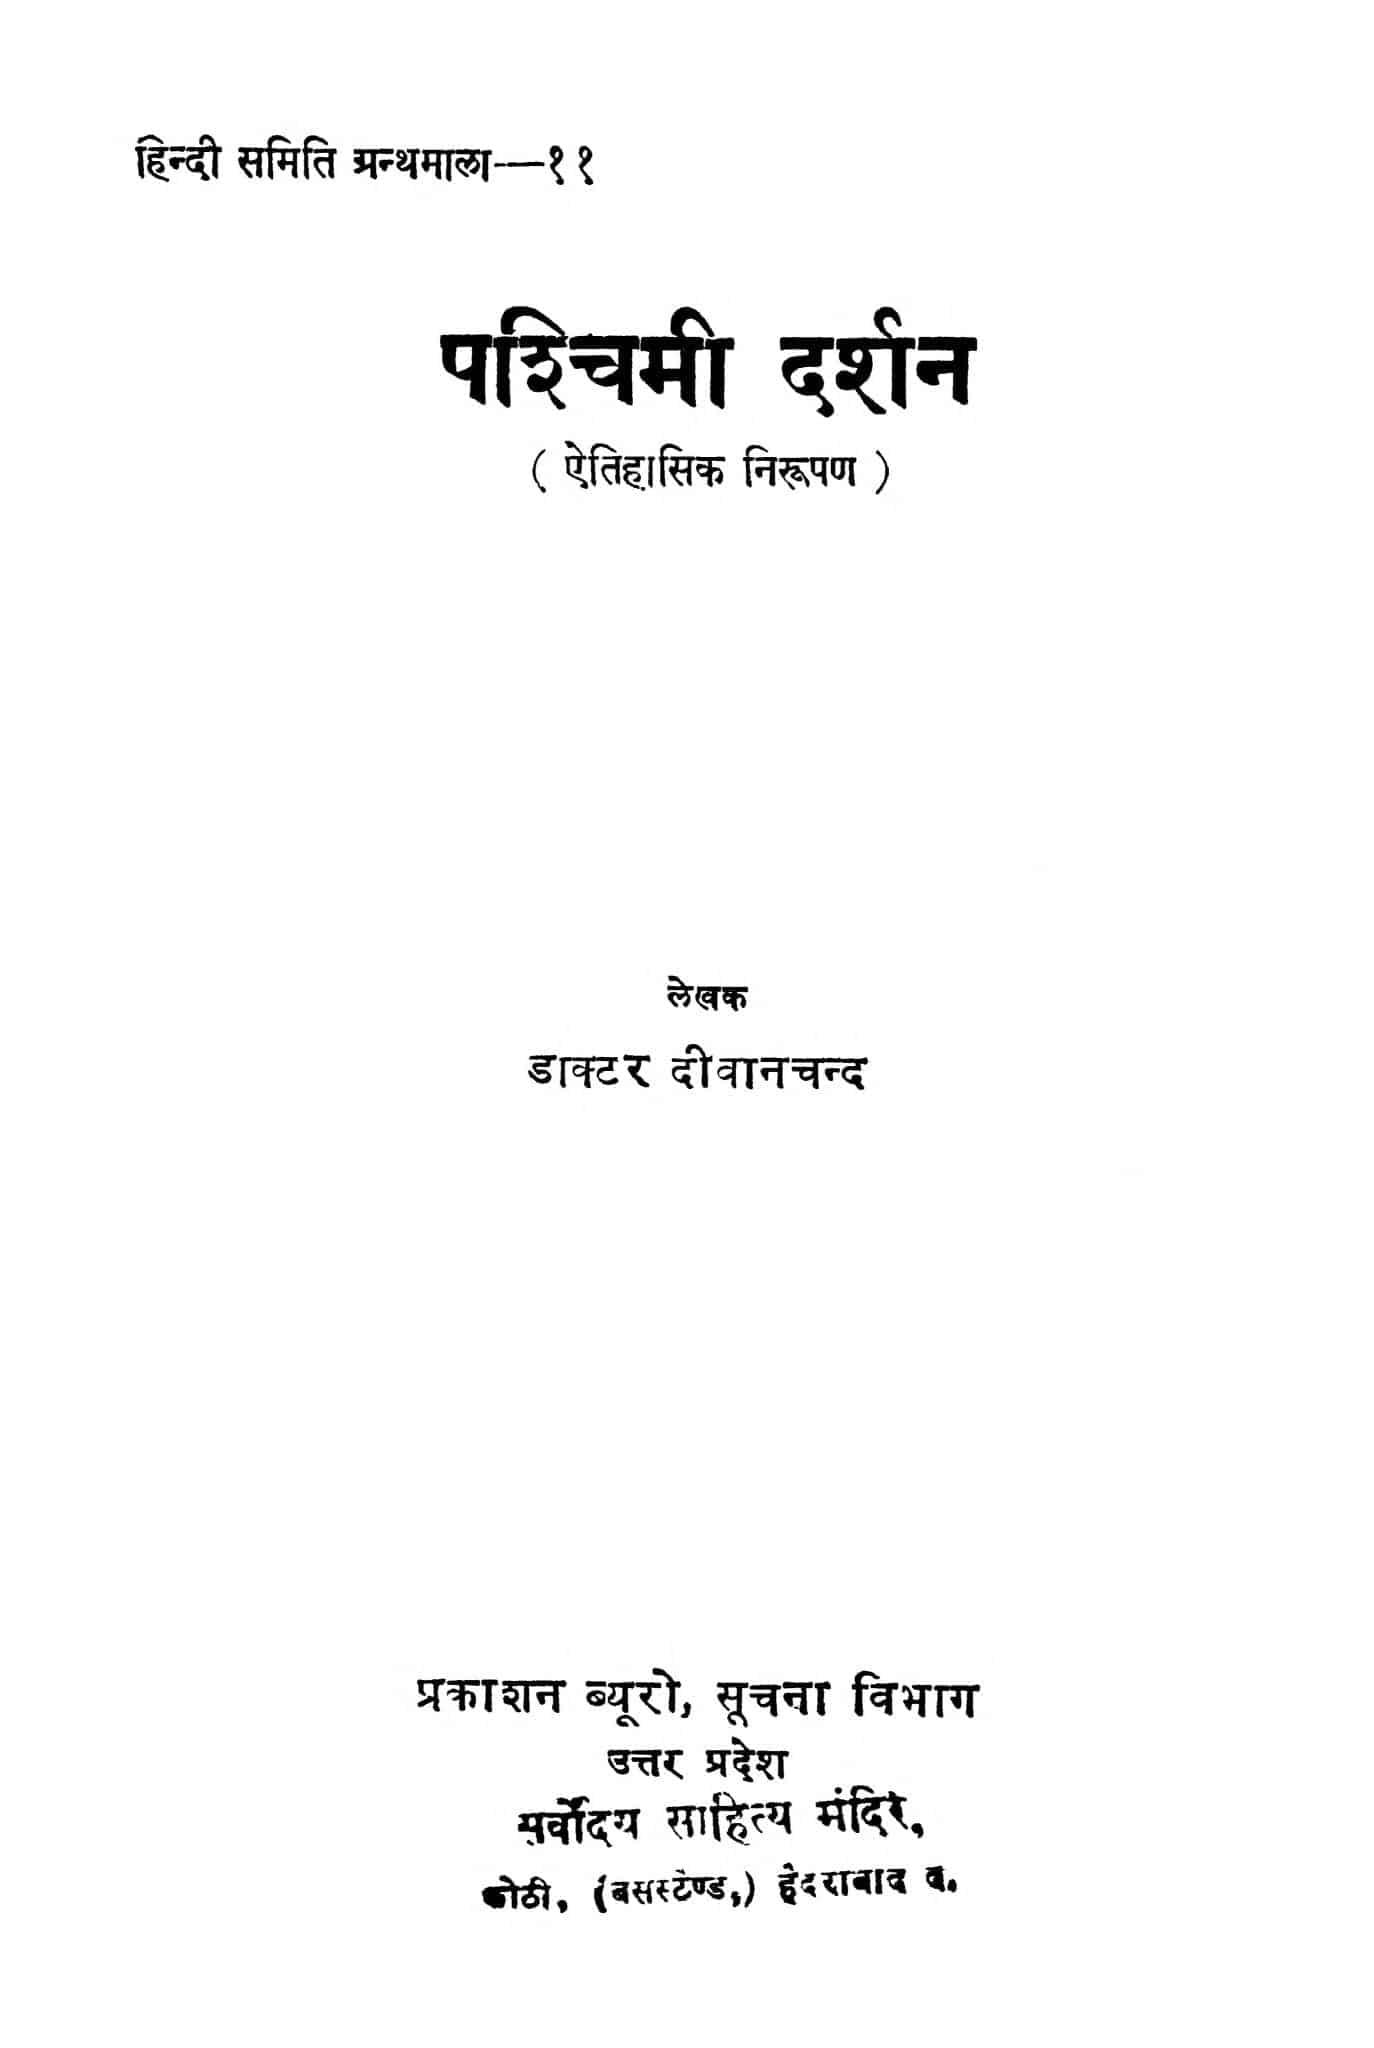 Book Image : पश्चिमी दर्शन  - Pashchimi Drashan